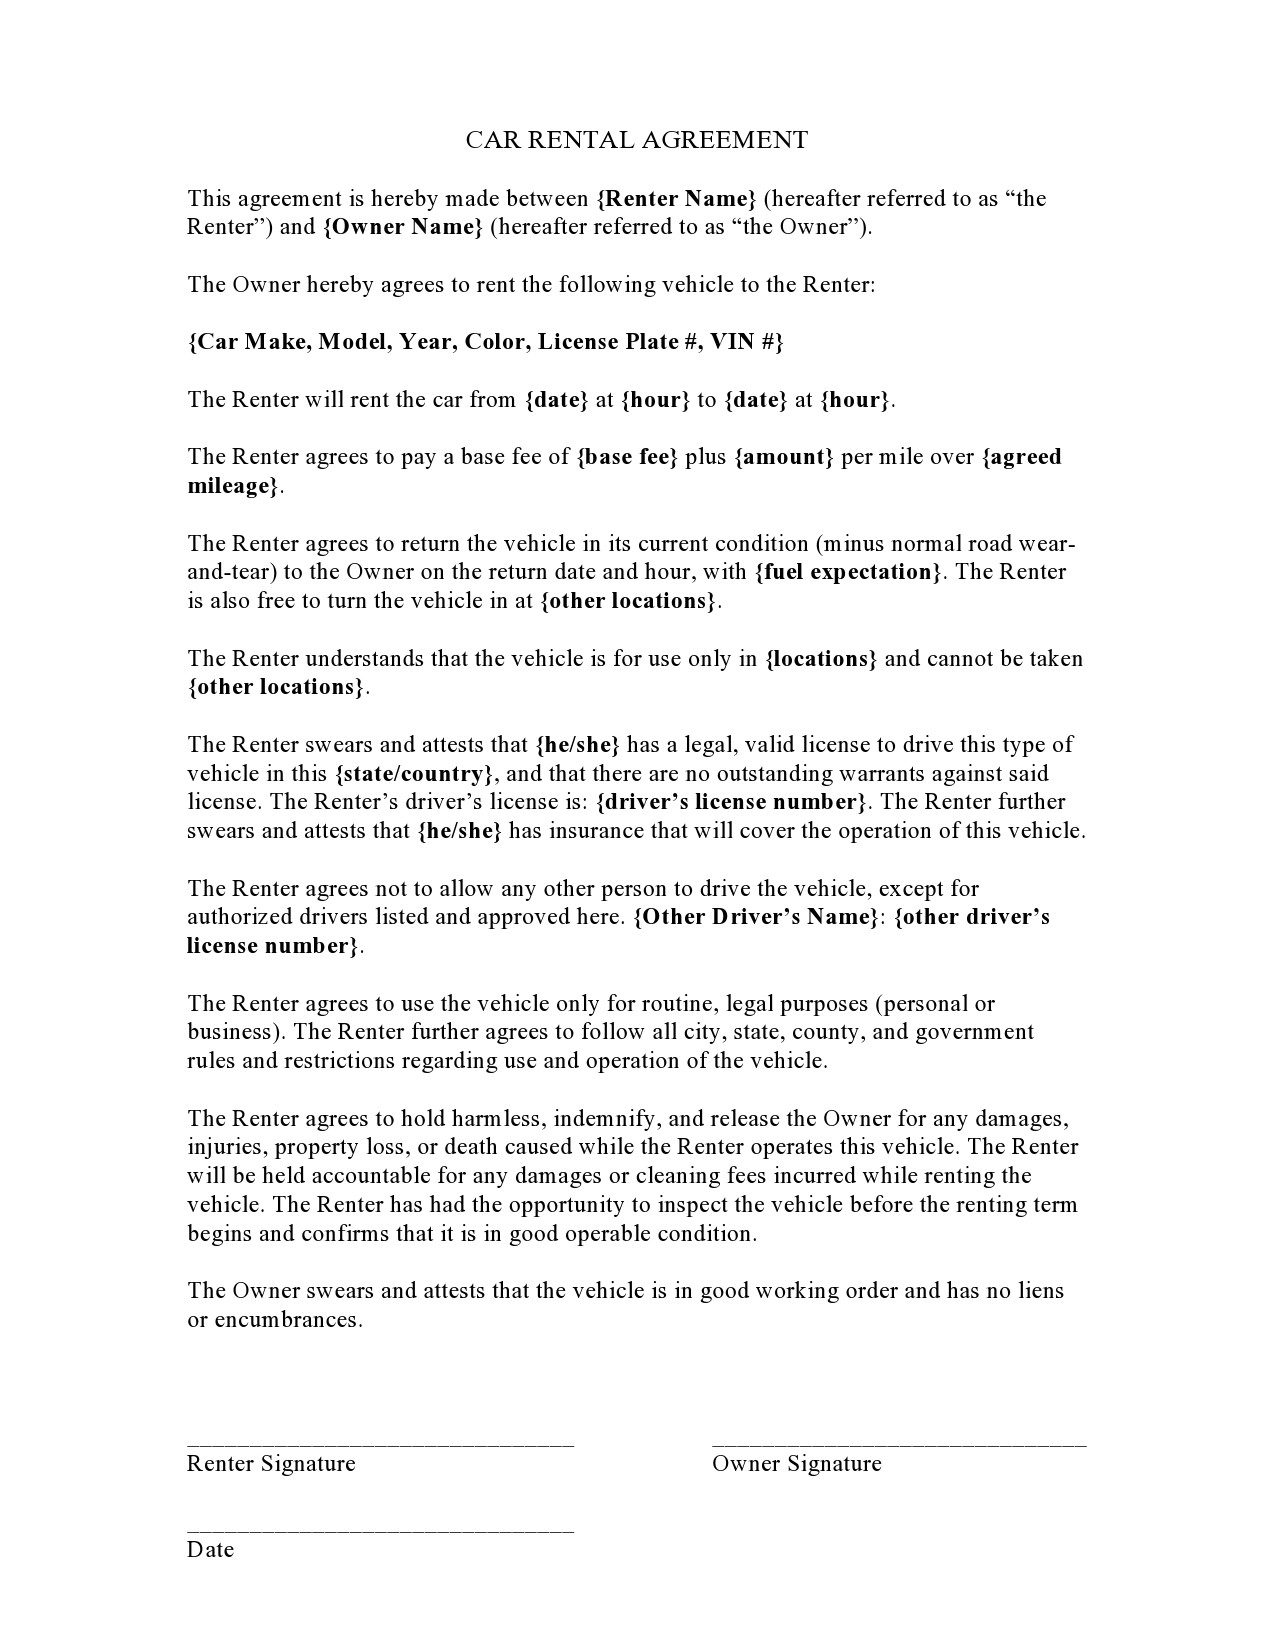 Free car rental agreement 03